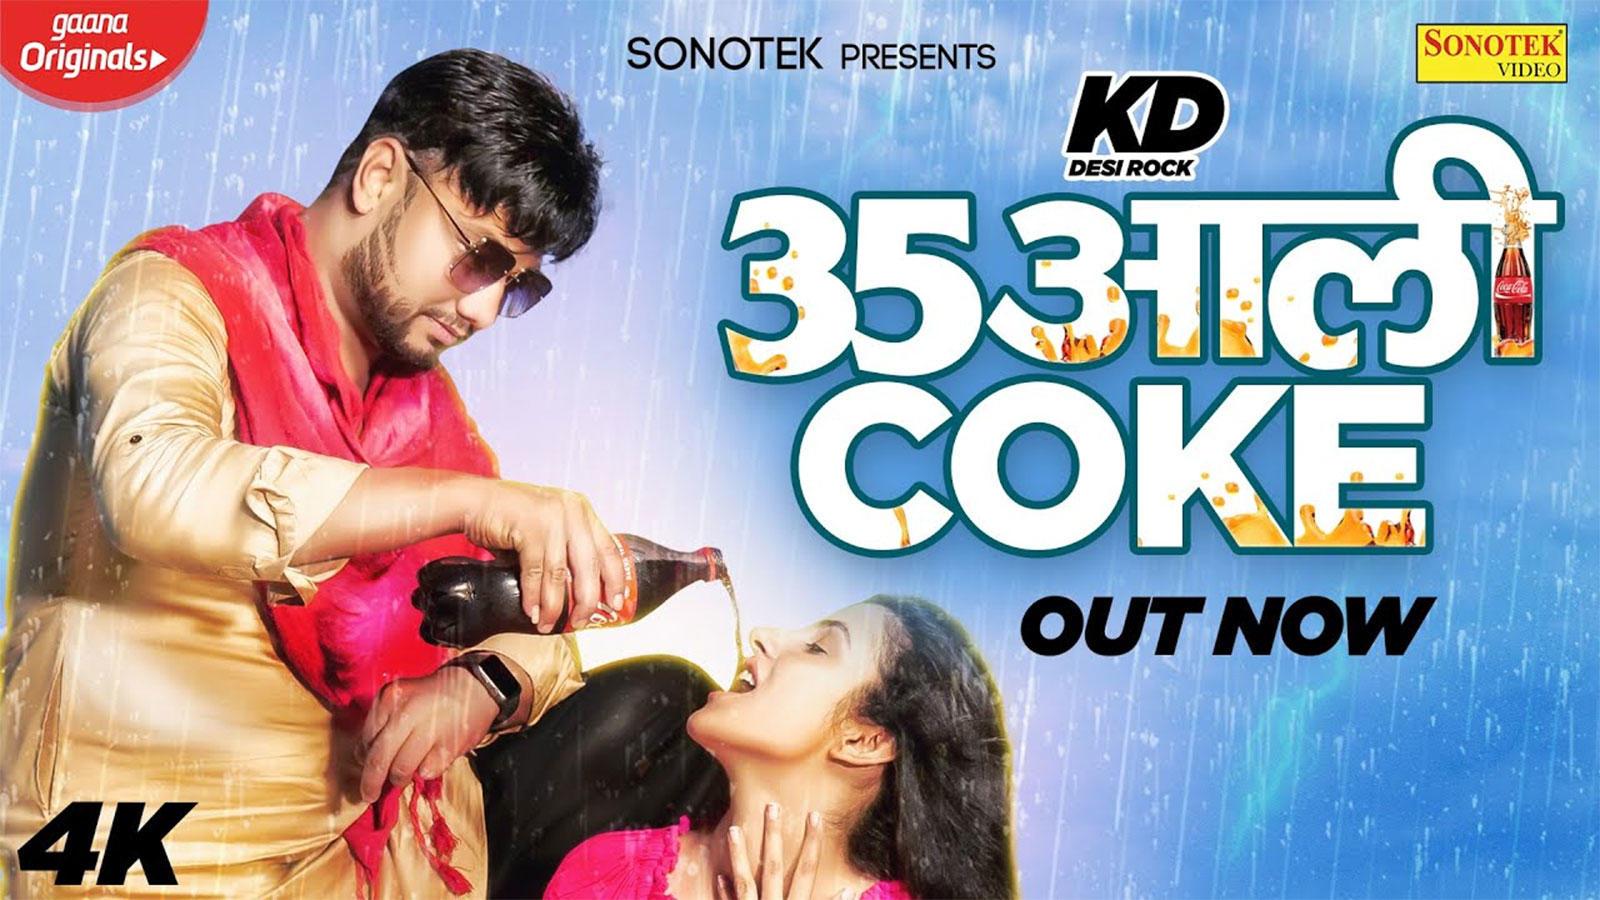 Haryanvi Gana New Video Songs Geet 2020: Latest Haryanvi Song '35 Aali  Coke' Sung by KD